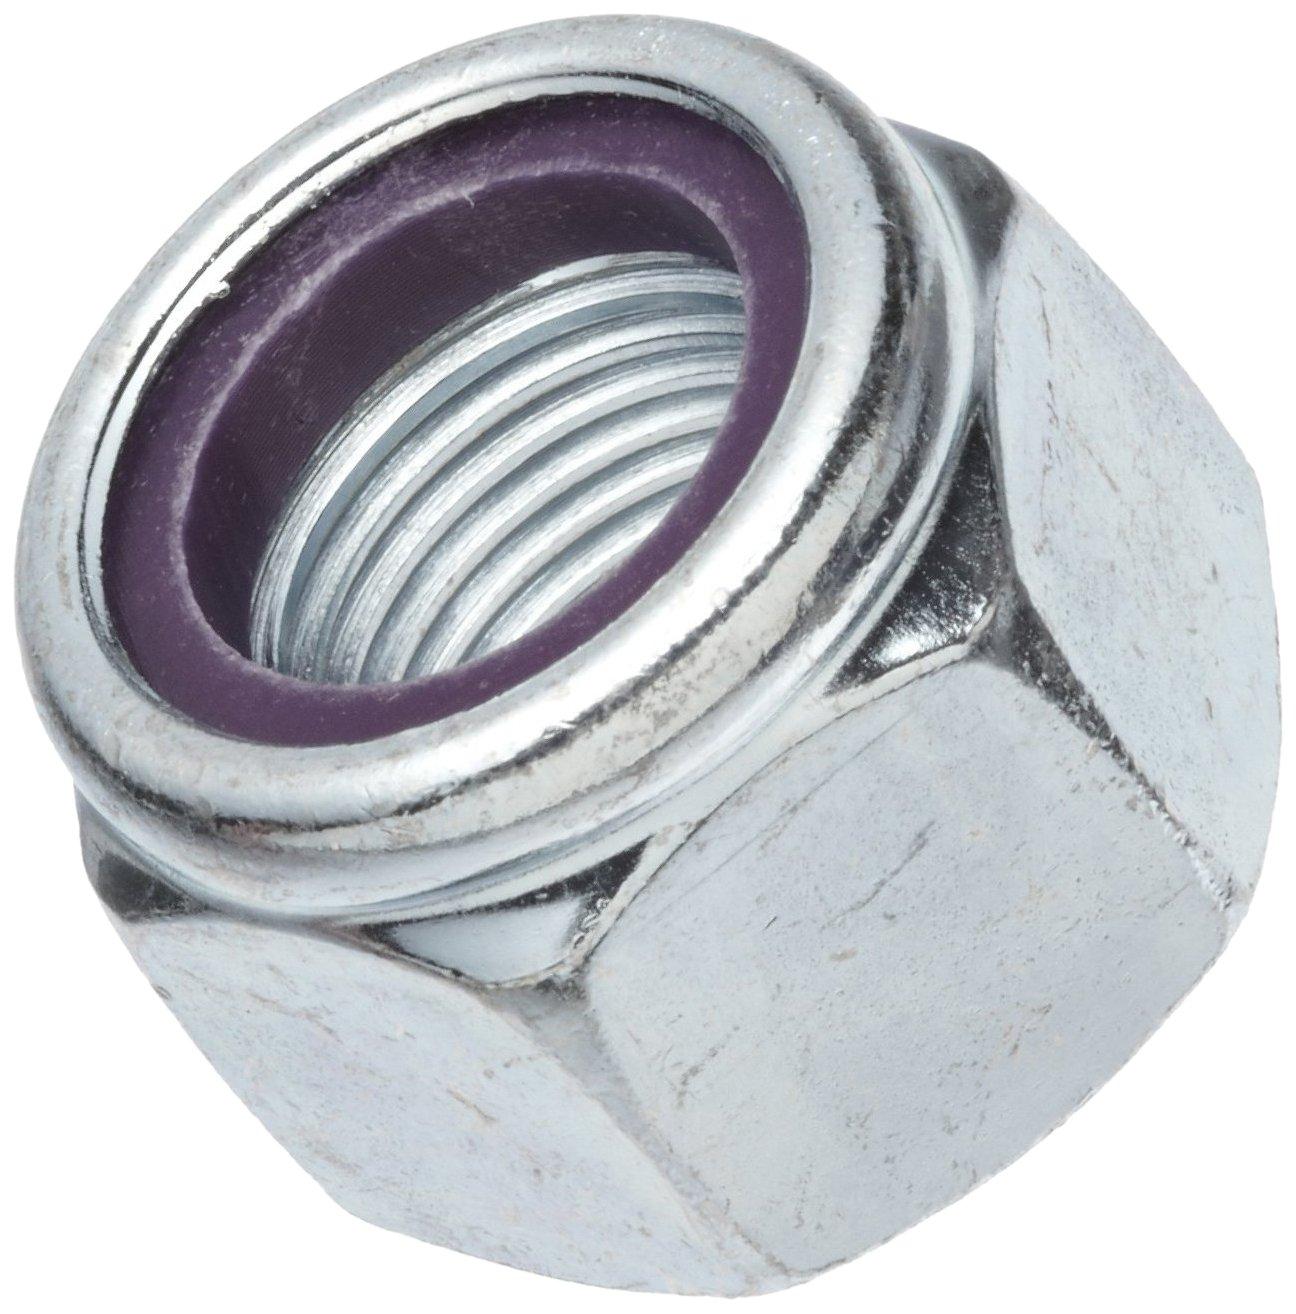 Steel Hex Nut 1-1//4-7 Threads Self-Locking Nylon Insert Grade 2 Right Hand Threads Zinc Plated Finish 2.038 Width Across Flats 1-1//4-7 Threads 2.038 Width Across Flats Continental-Aero 41NE207